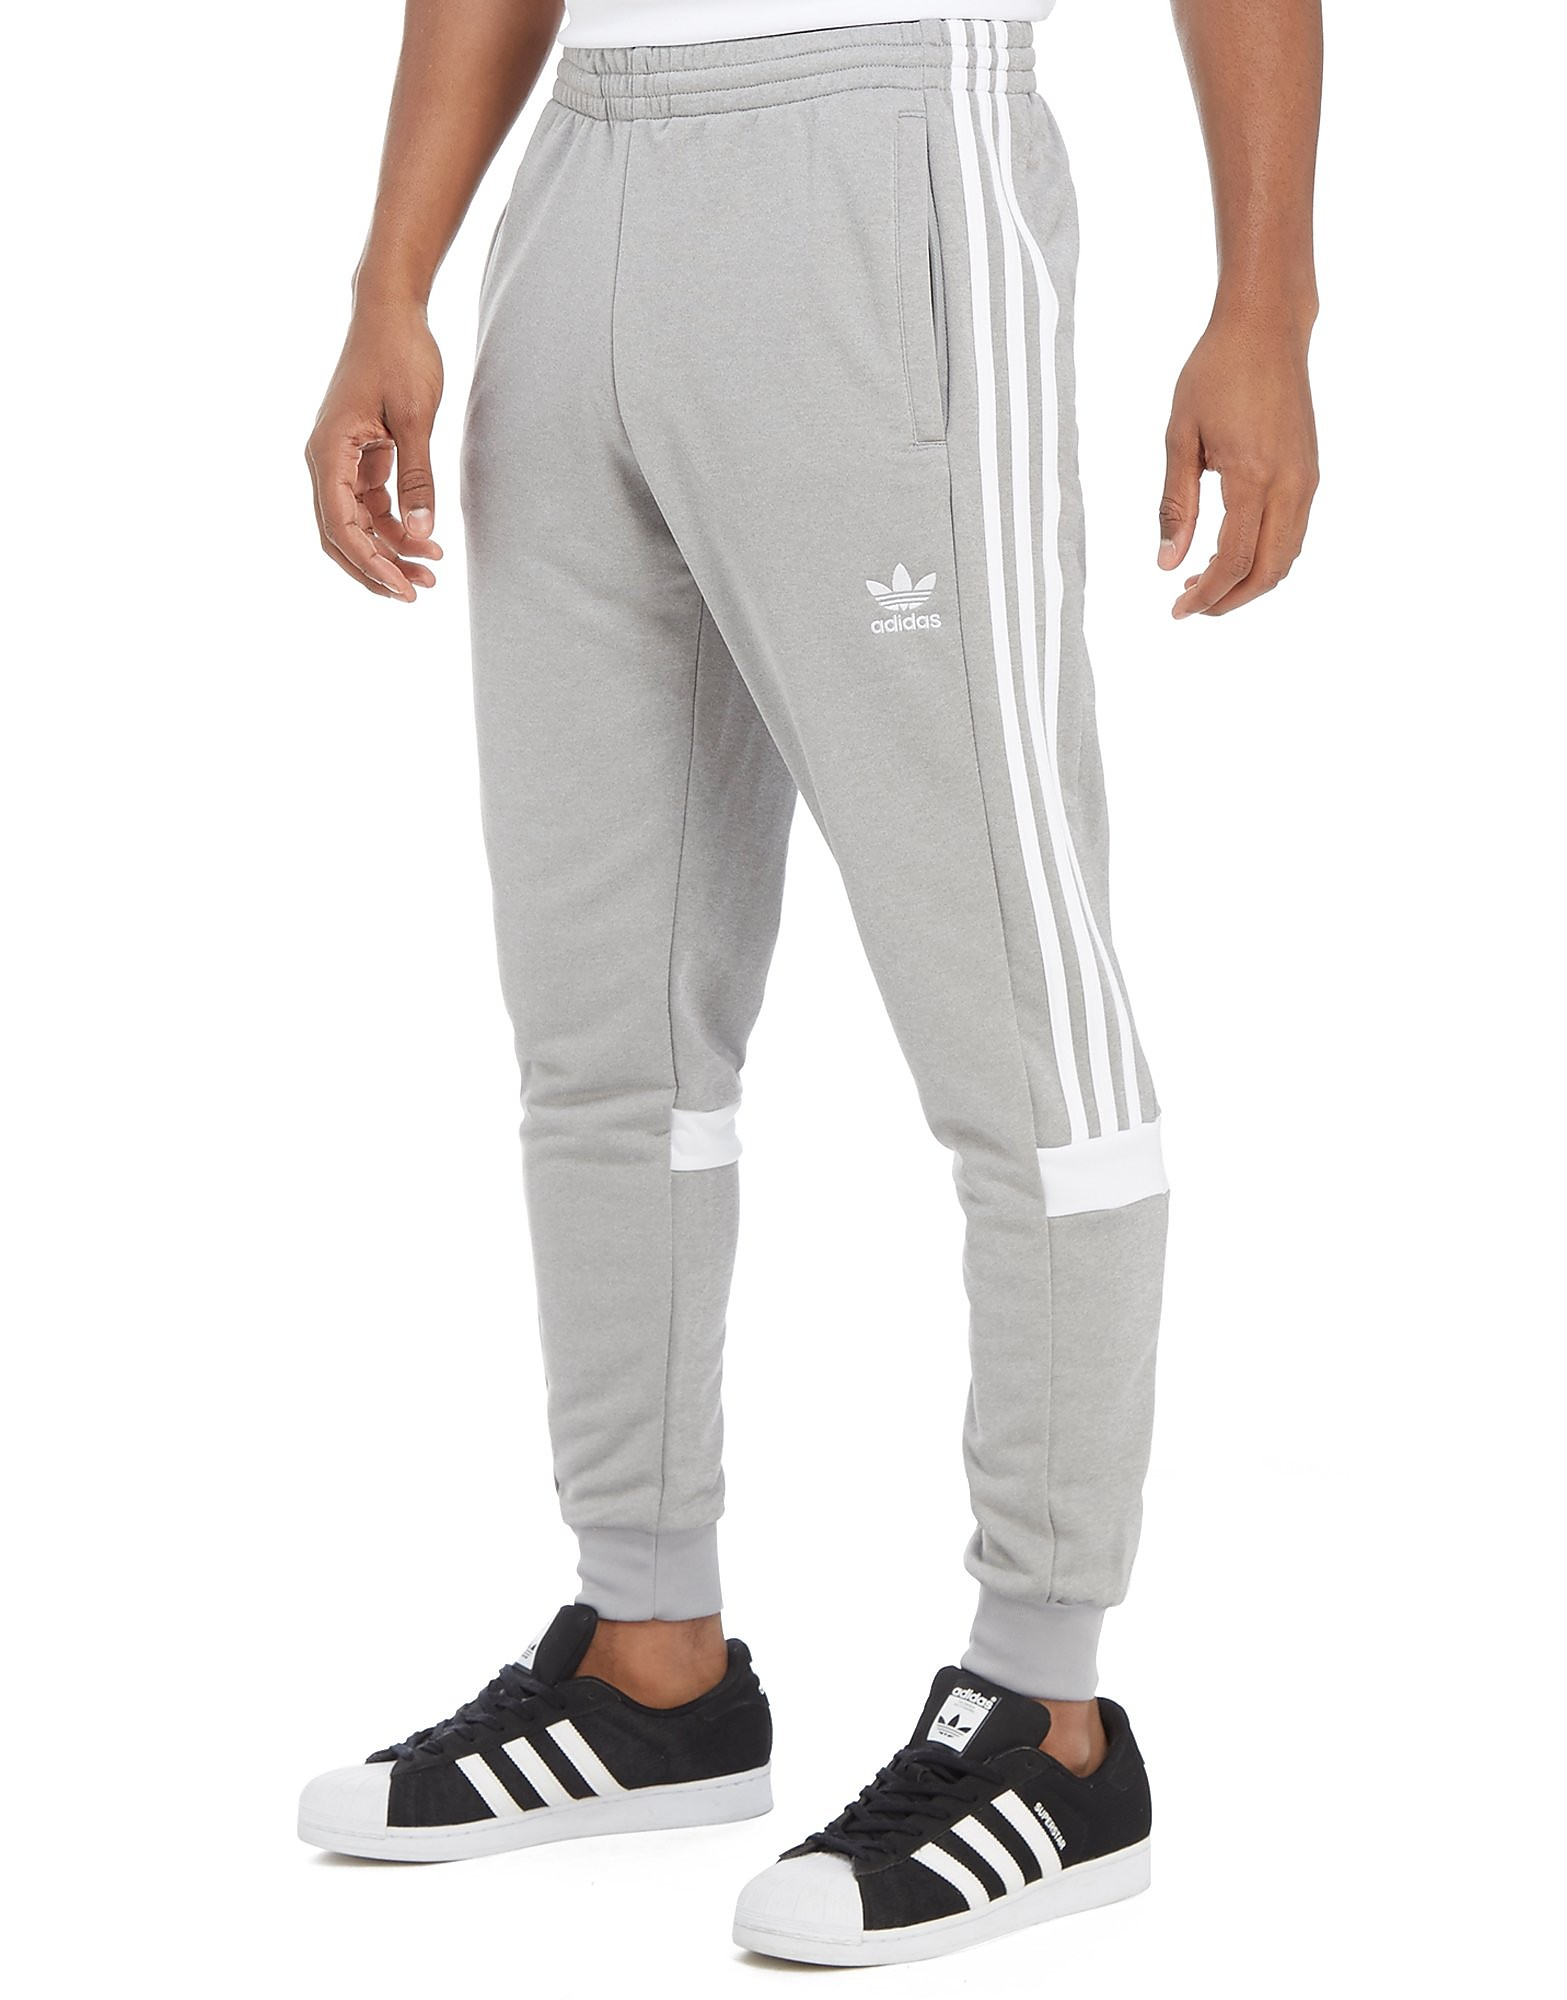 adidas Originals pantalón Superstar Colourblock